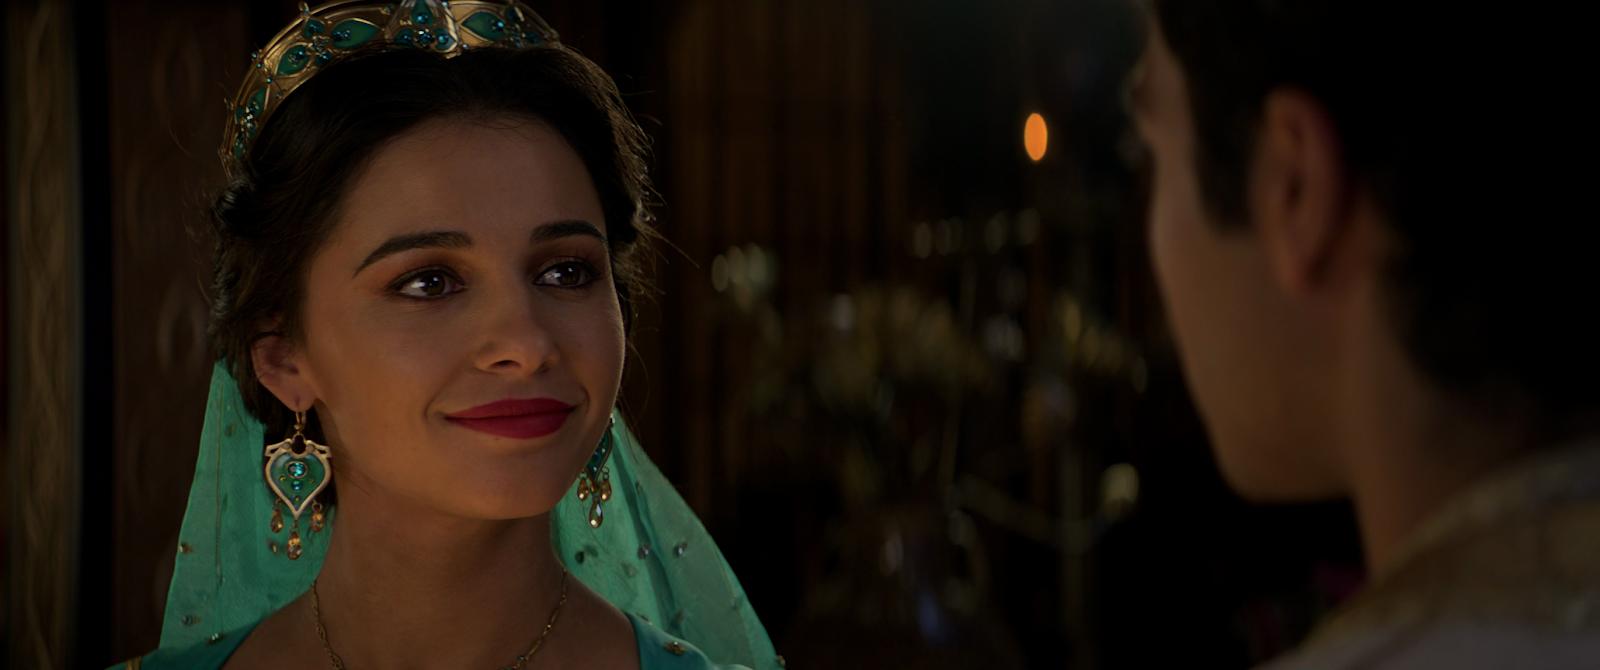 Aladdin (2019) 4K UHD 20160p Latino